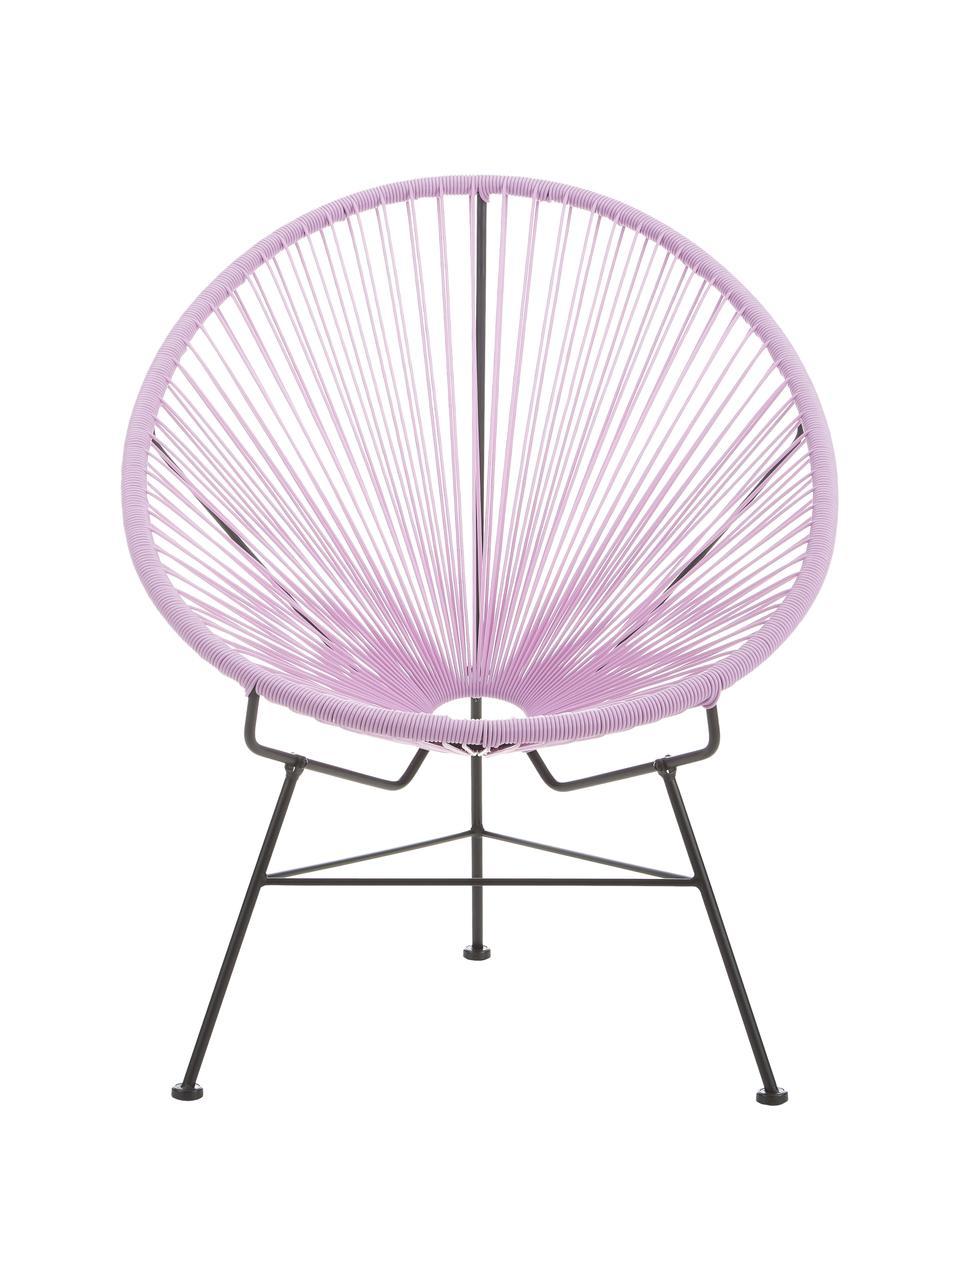 Loungesessel Bahia aus Kunststoff-Geflecht, Sitzfläche: Kunststoff, Gestell: Metall, pulverbeschichtet, Lila, B 81 x T 73 cm